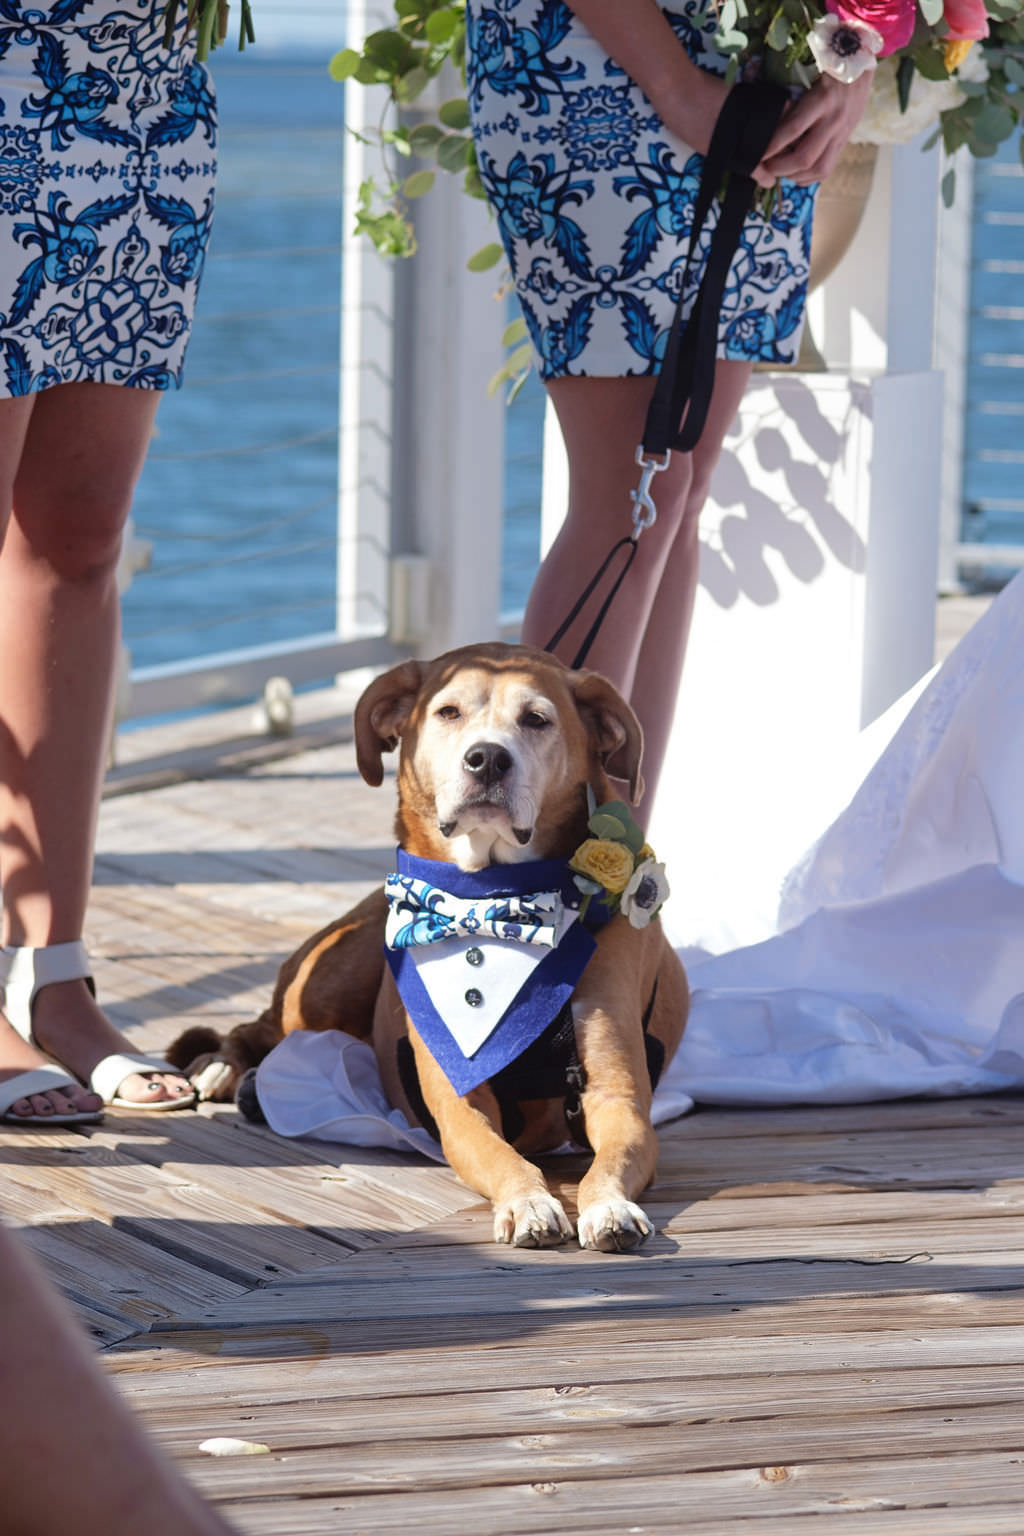 Dog in Blue Tuxedo Wedding Ceremony Waterfront Portrait | Island Inspired Wedding Venue The Godfrey Hotel and Cabanas Tampa | Tampa Bay Photographer Marc Edwards Photographs | FairyTail Pet Care